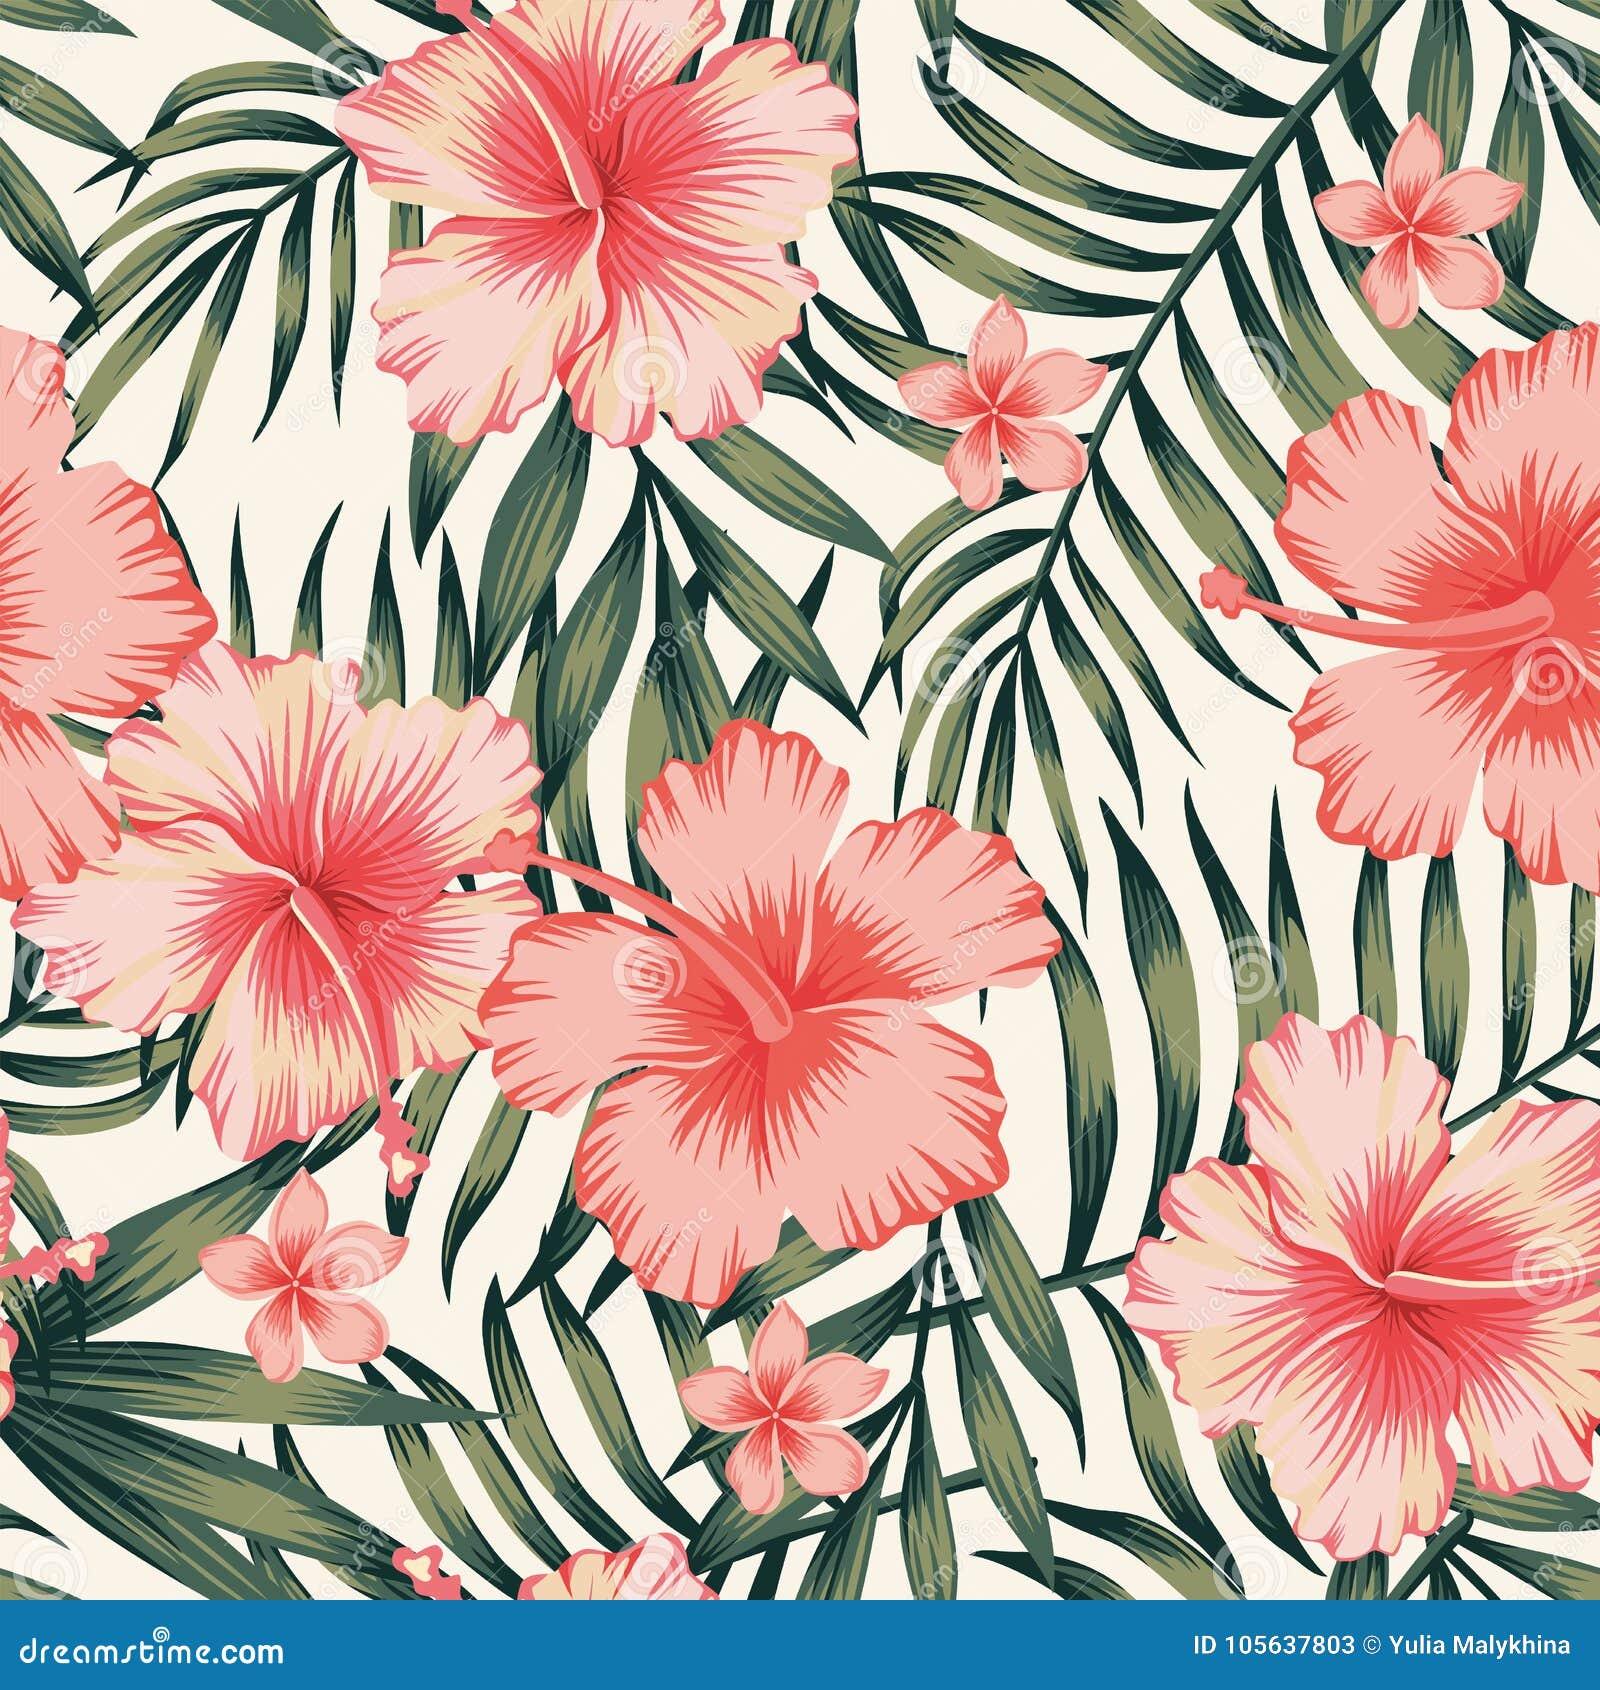 Pink Flowers Wallpaper: Hibiscus Pink Palm Leaves Dark Green Pattern Stock Vector